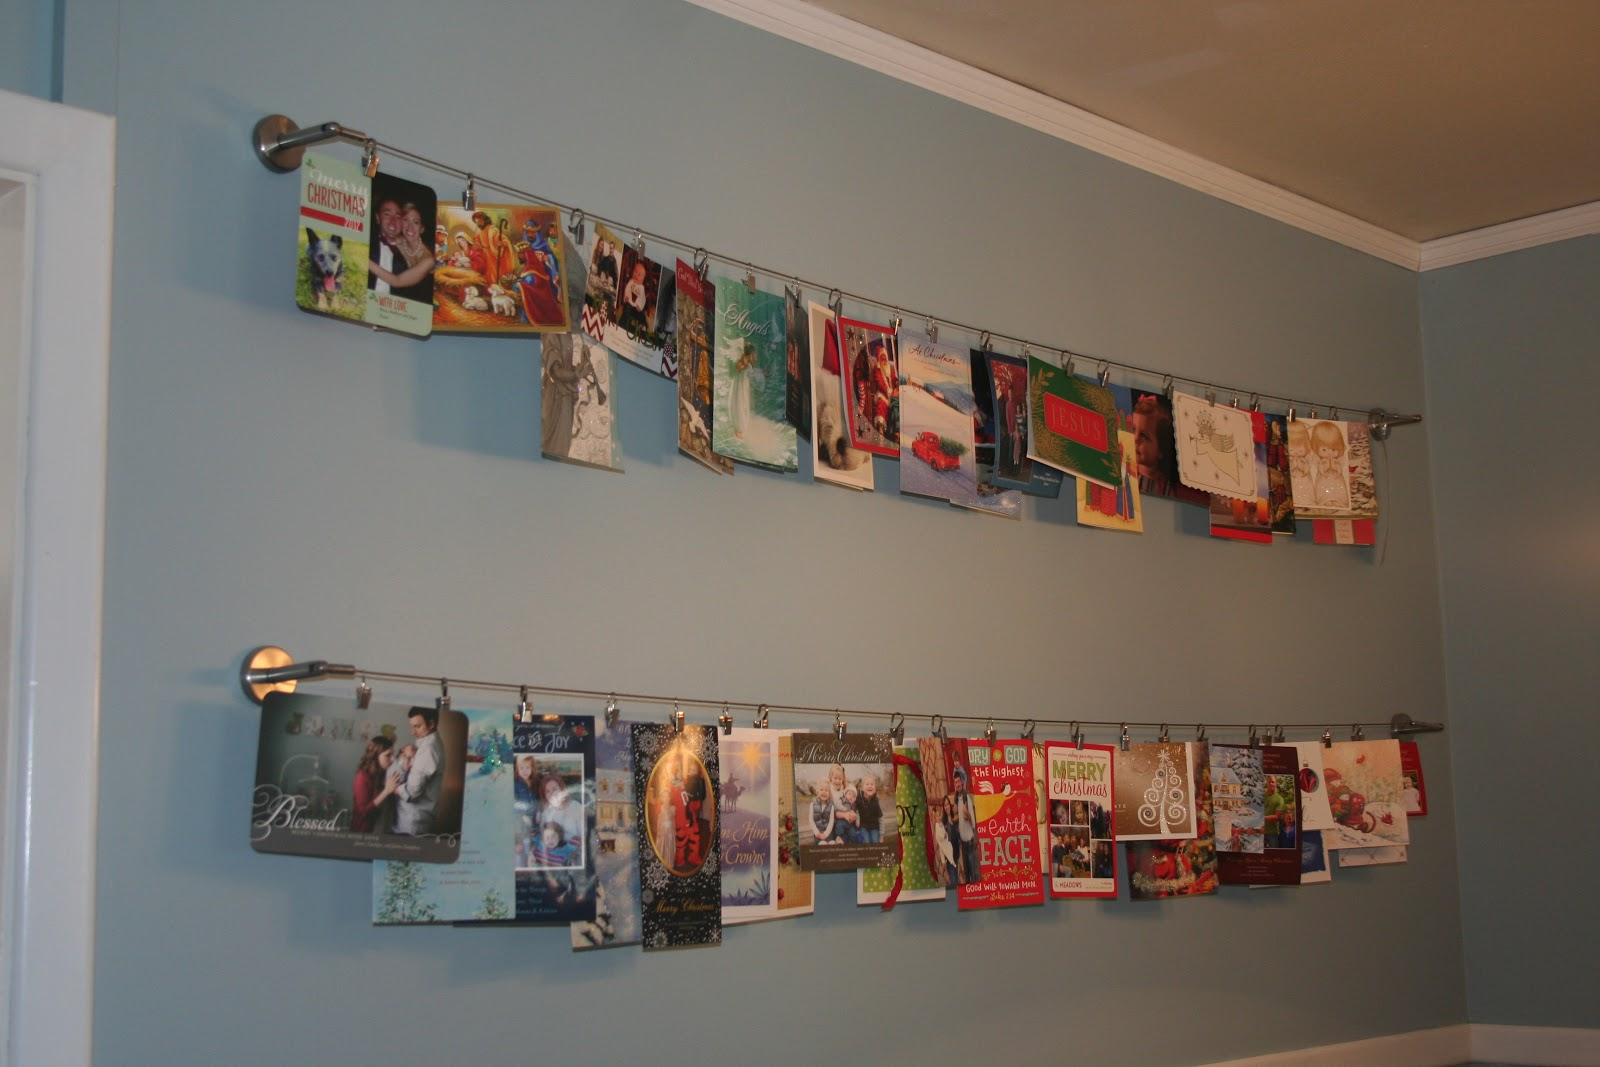 How To Hang Christmas Cards - House Beautiful - House Beautiful